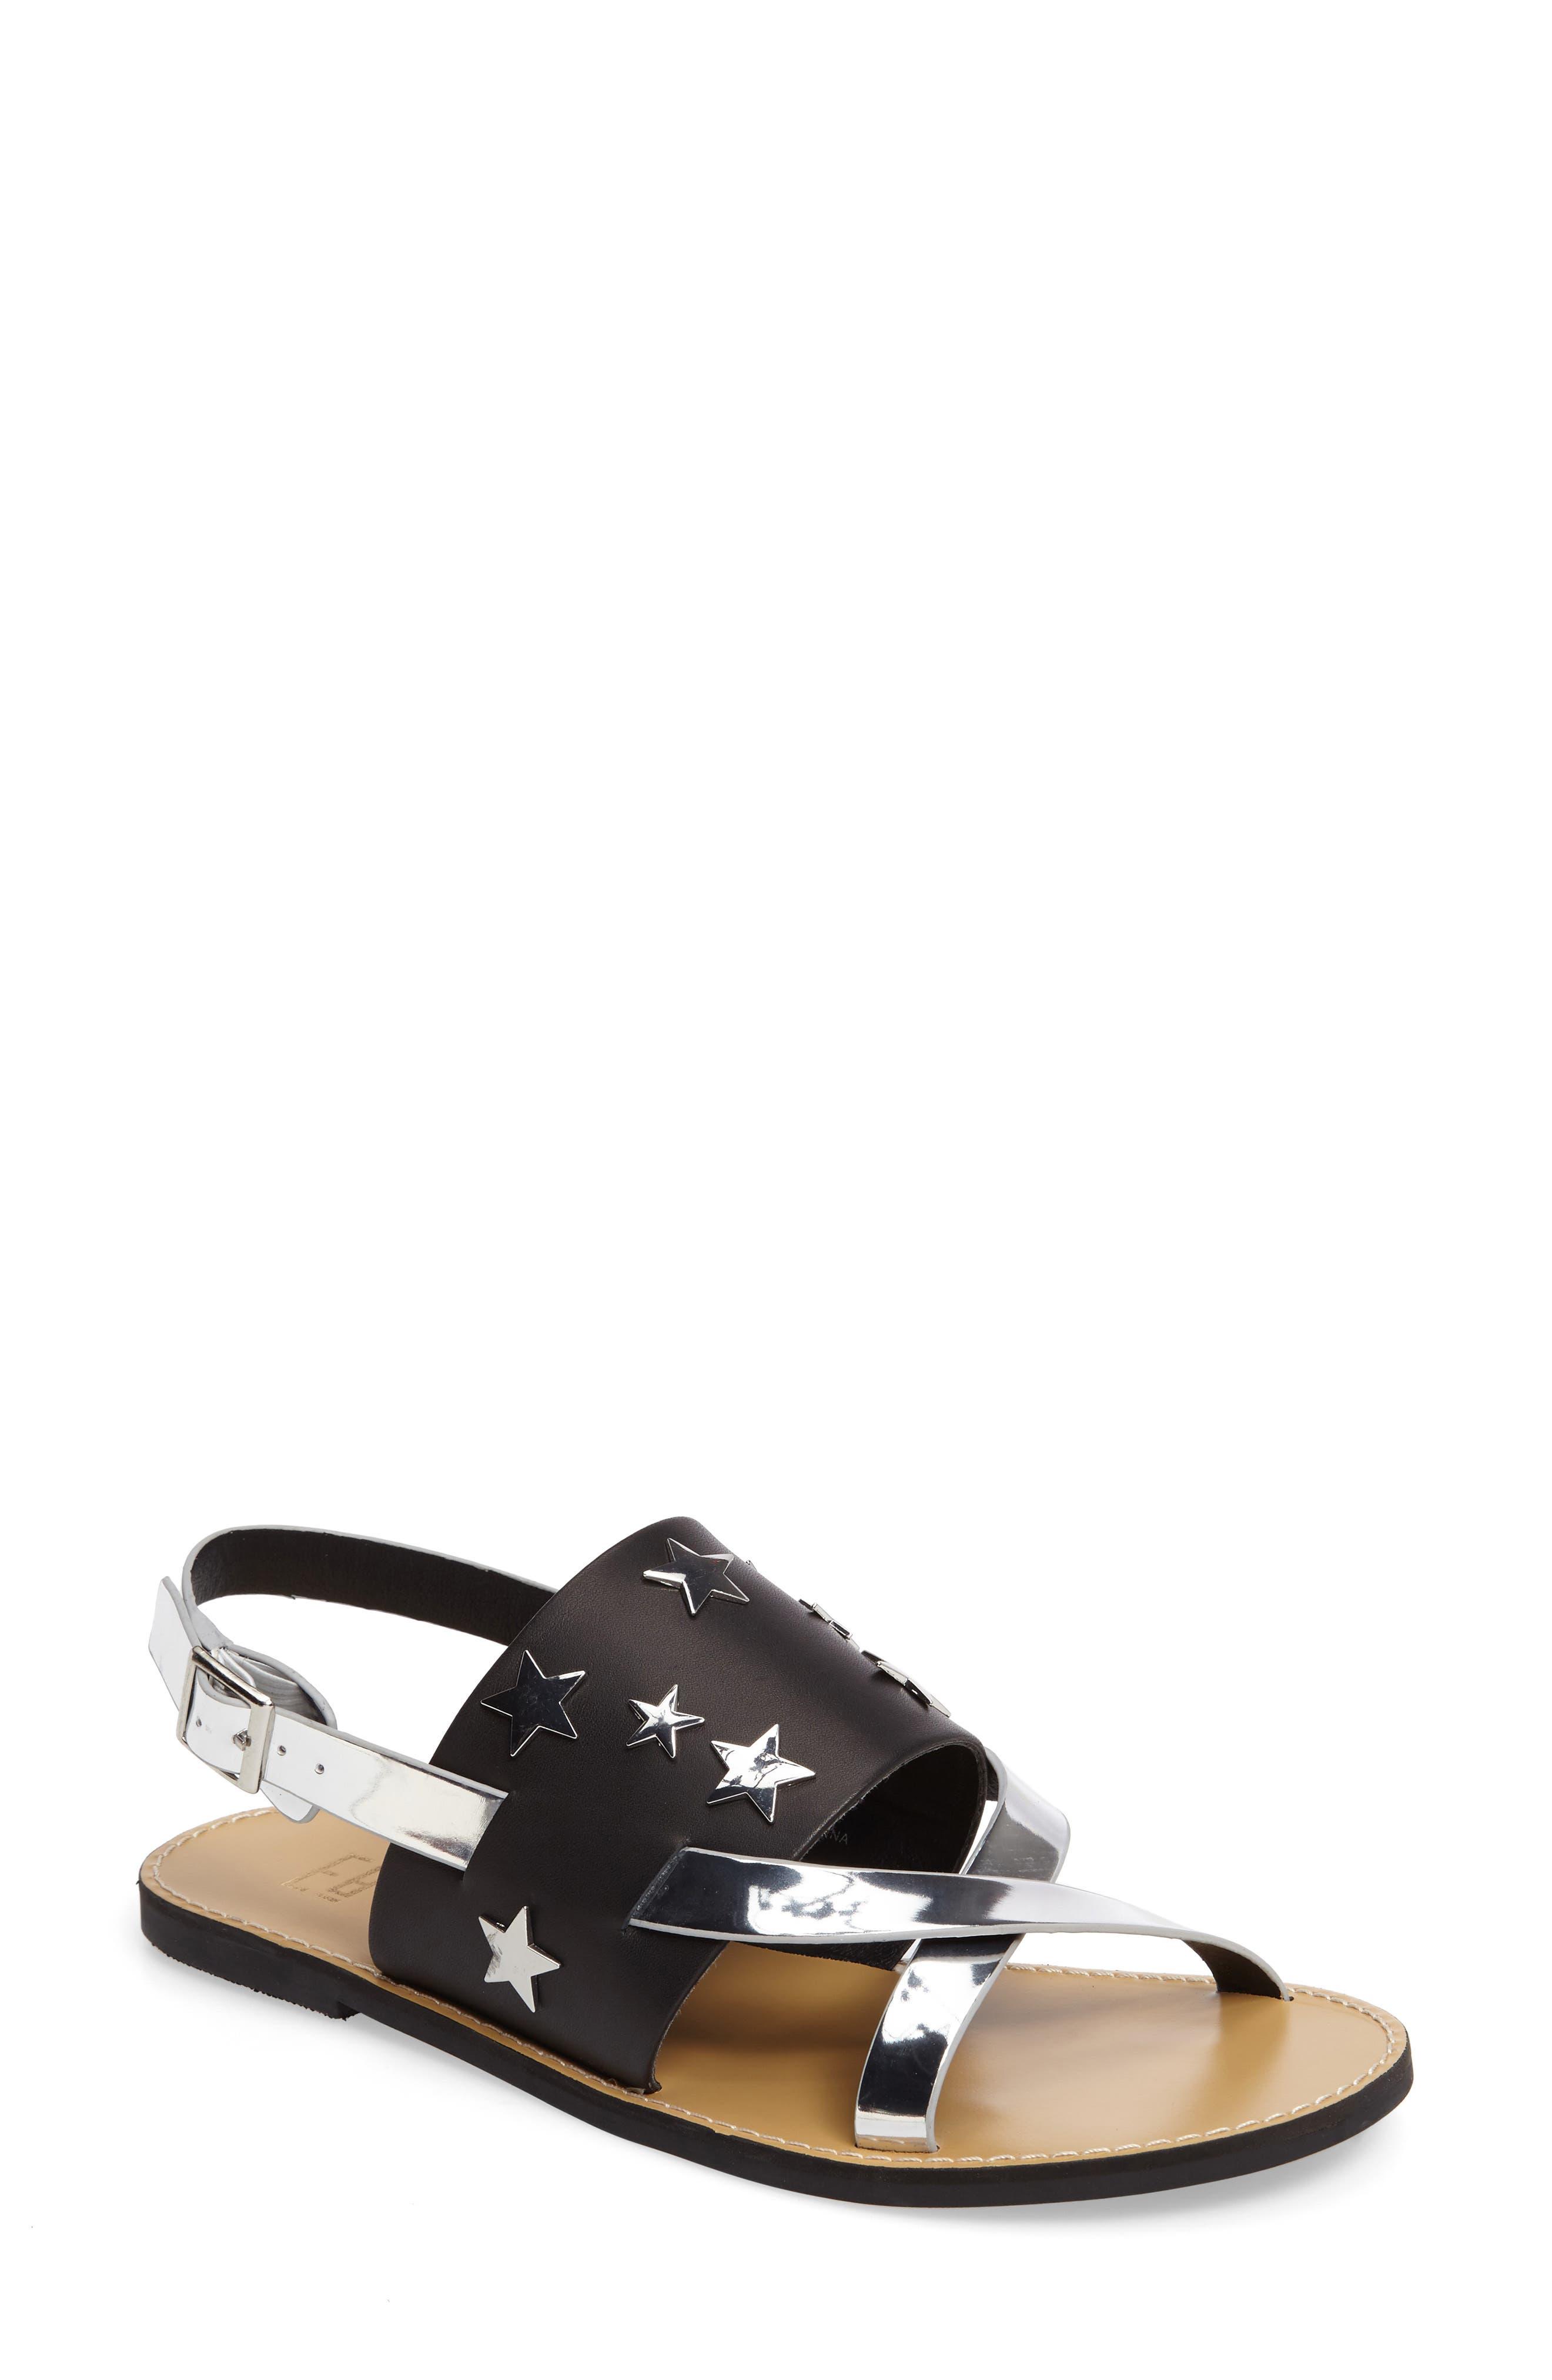 Salome Star Sandal,                         Main,                         color, 001